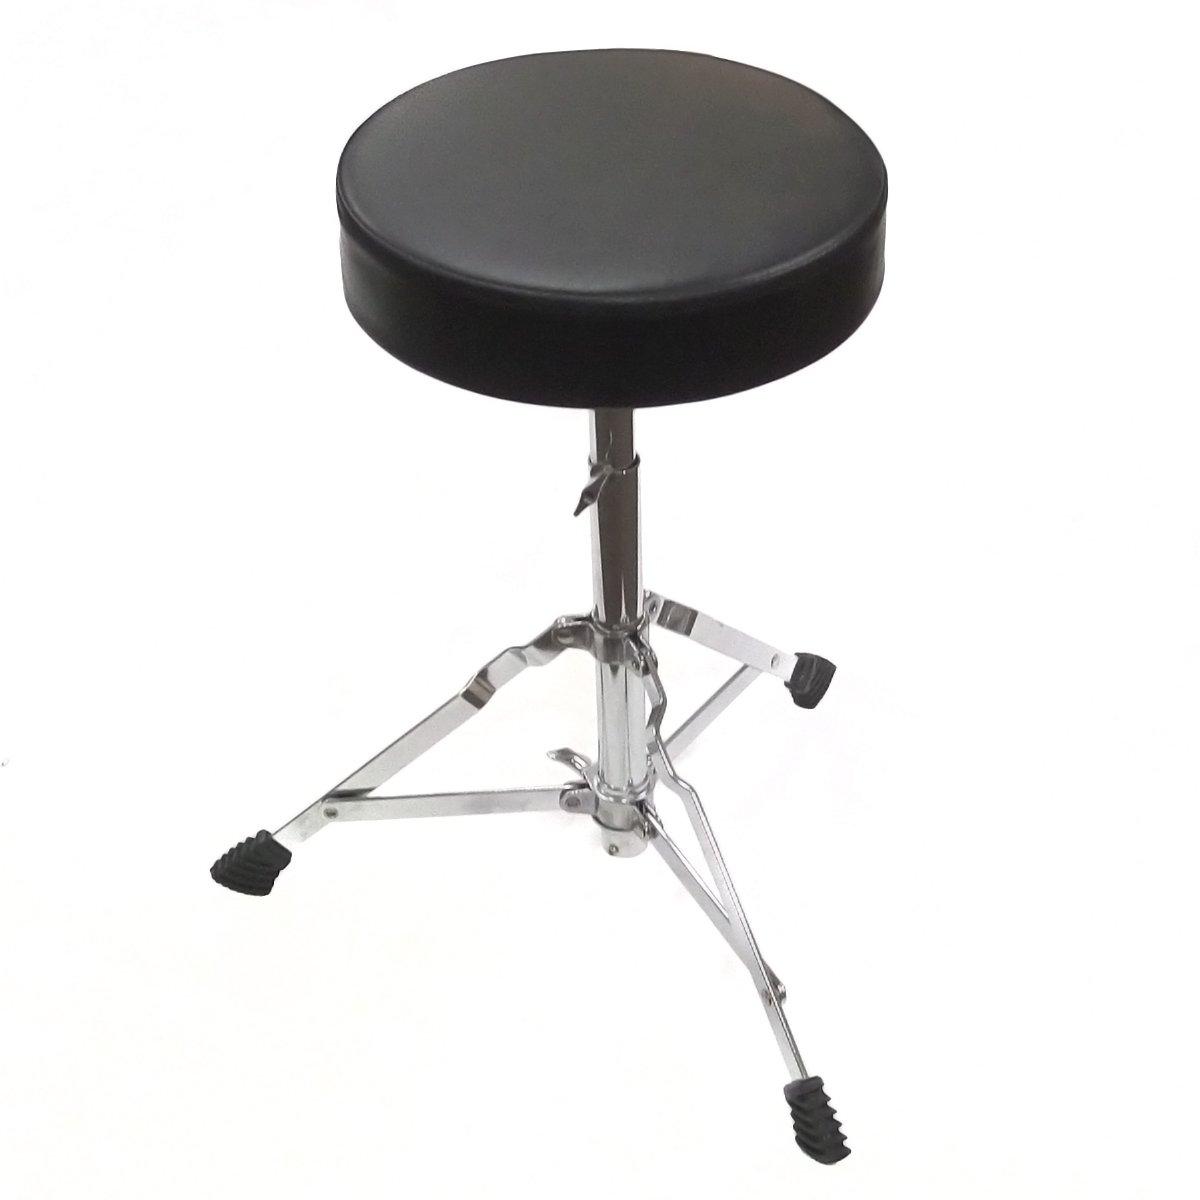 Performance Plus JDT1 Drum Throne Junior Size Stool for 3 Piece and 5 Piece Drum Set